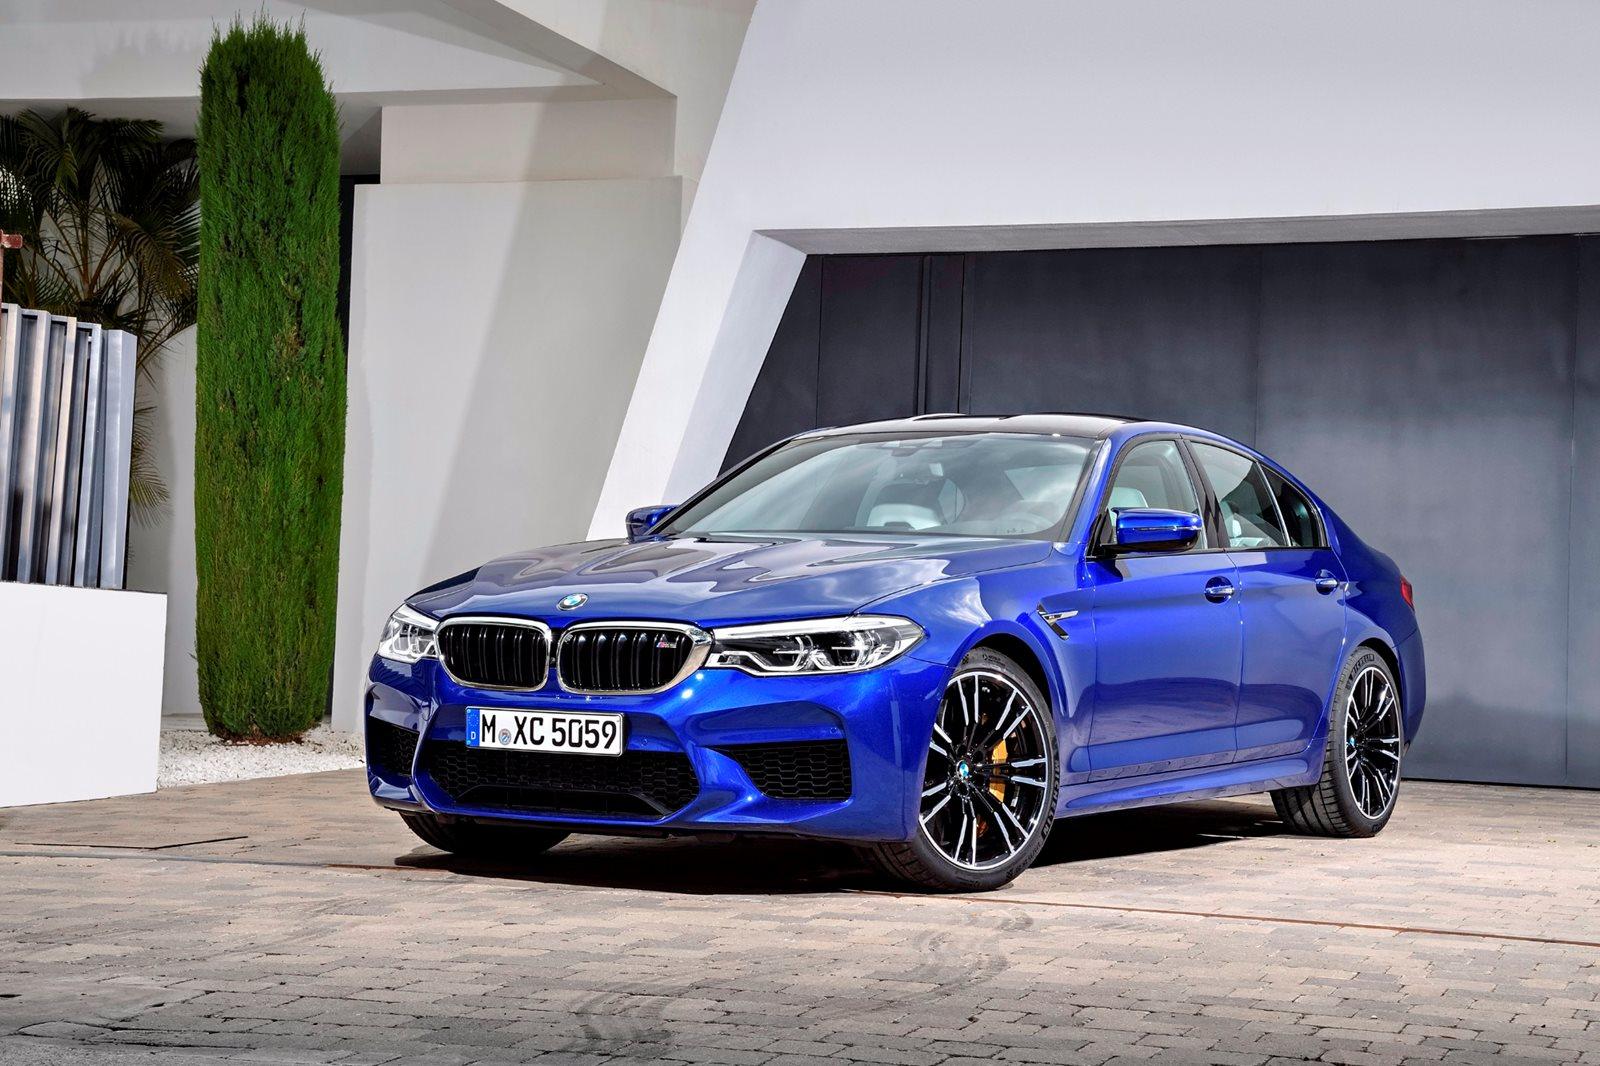 2020 BMW M5 Xdrive Awd Price